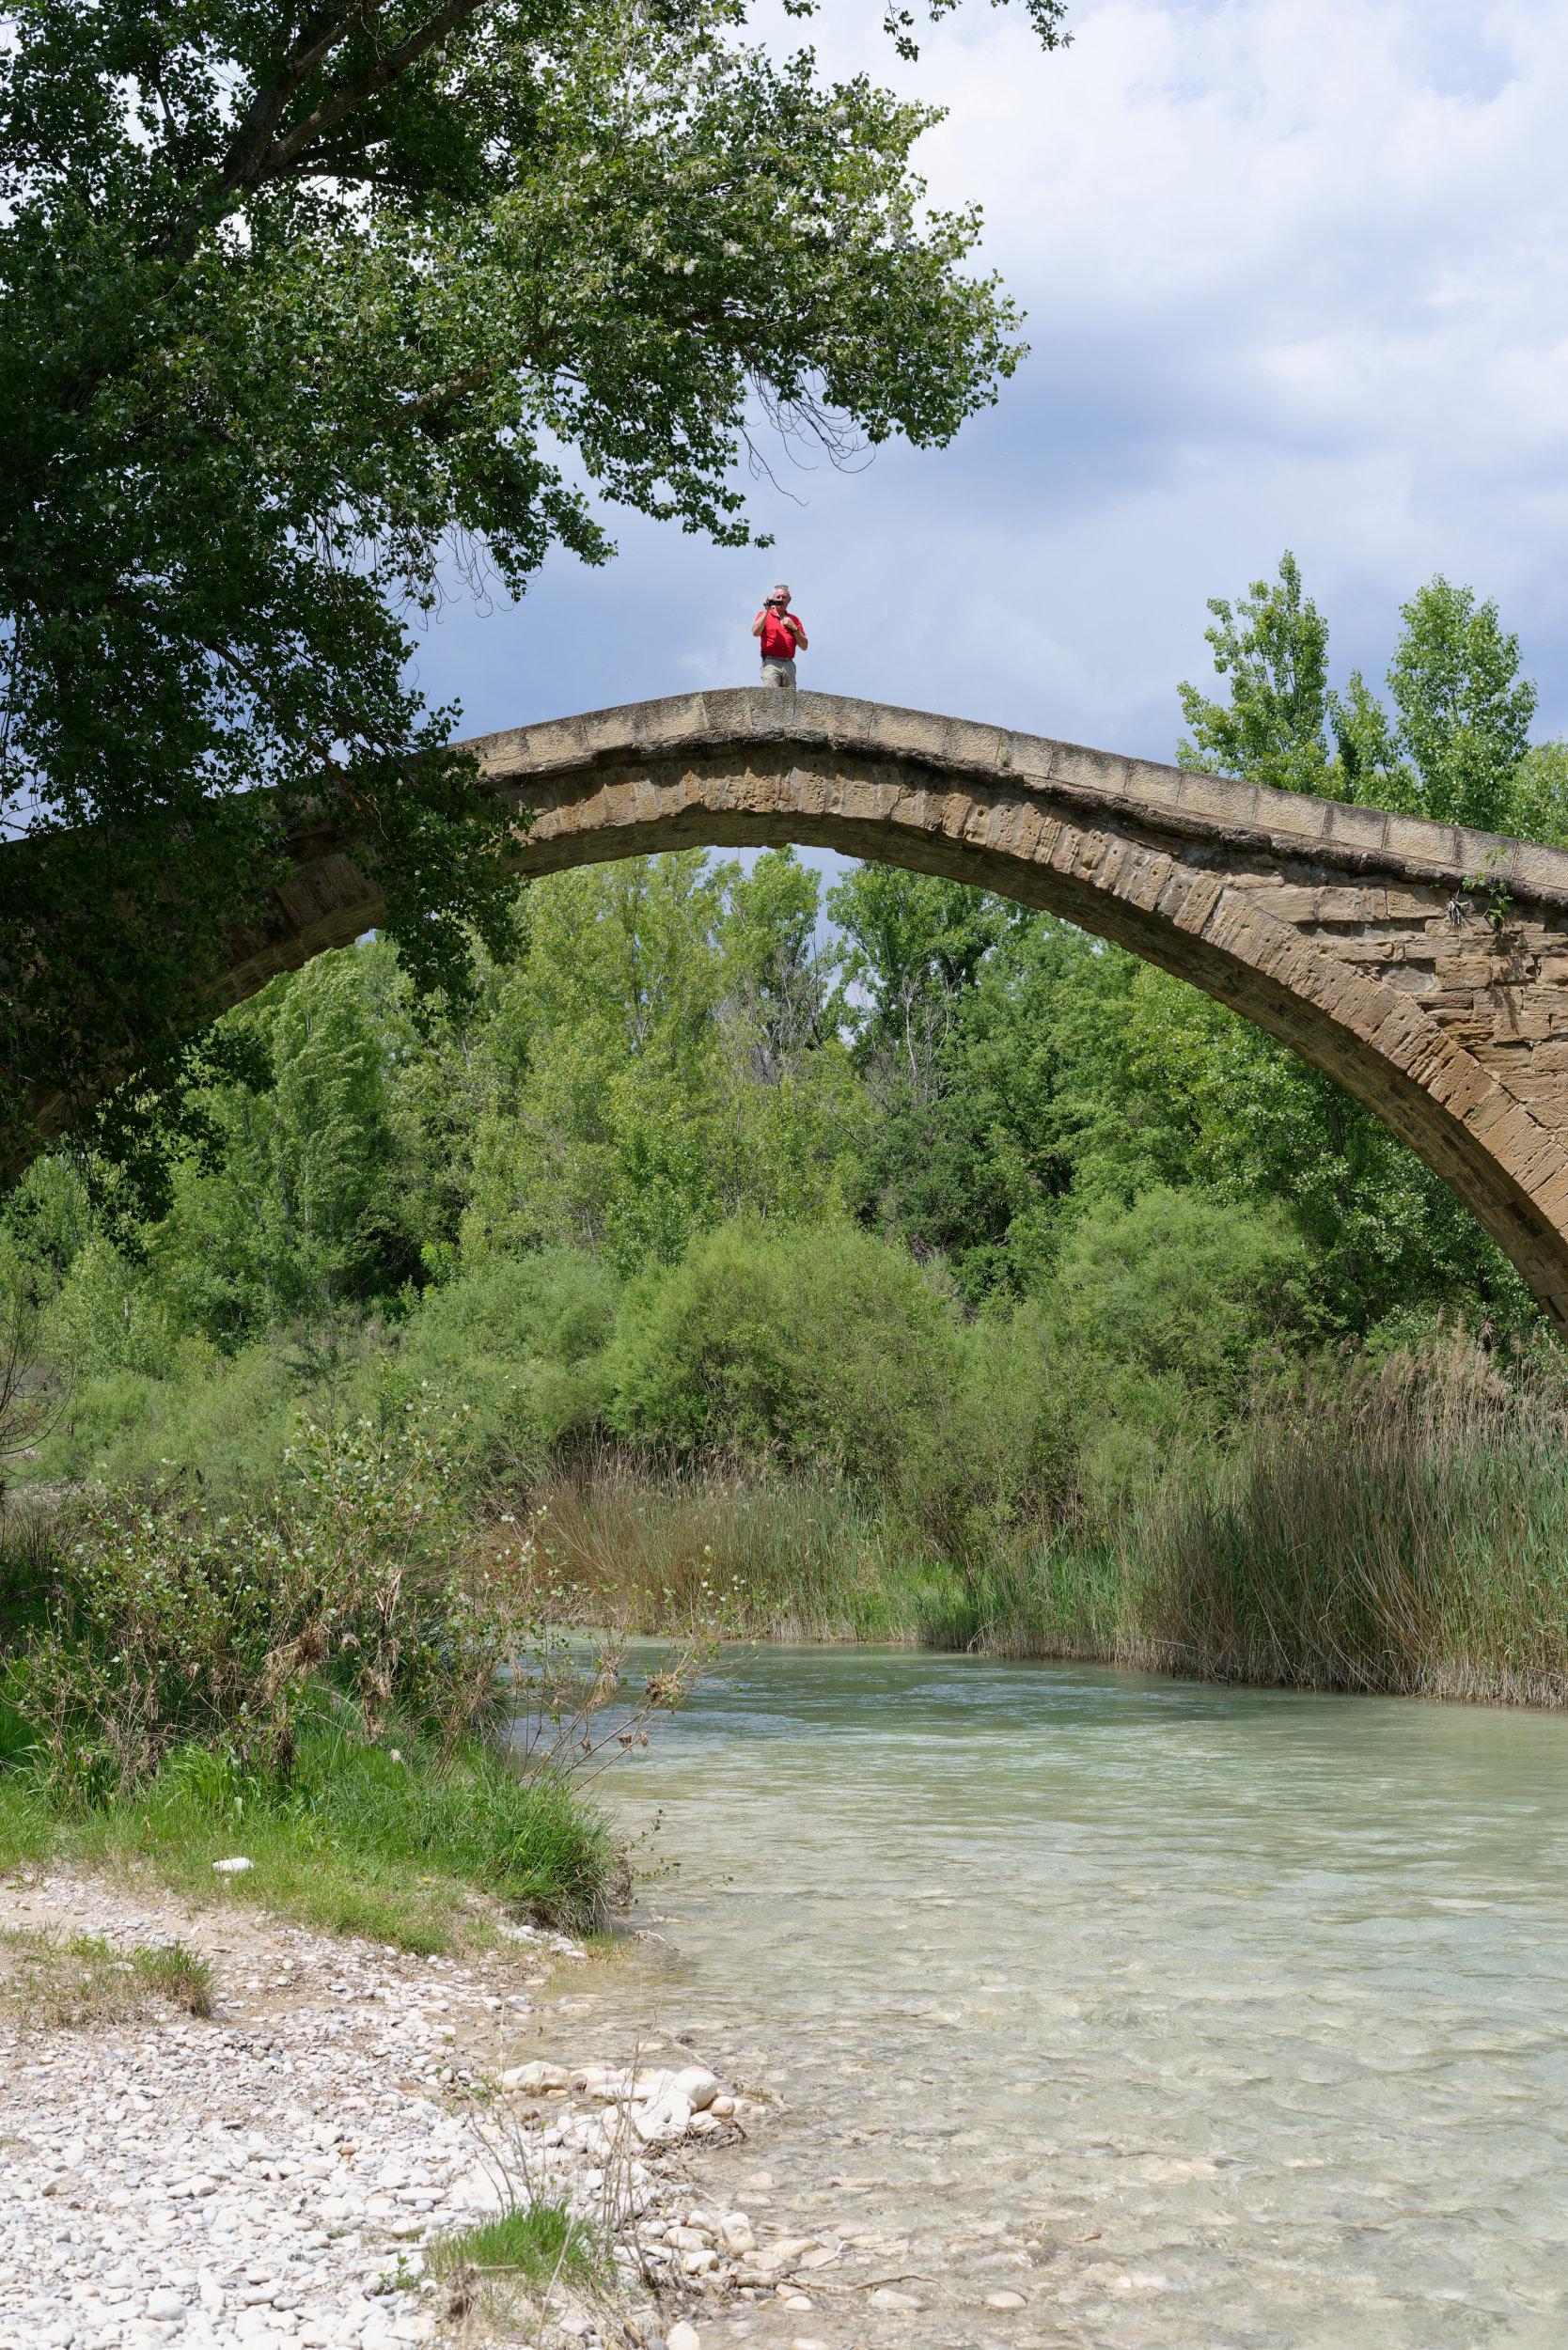 180523-6-Pont roman de Villacantal (18) (Somontano-Aragon)